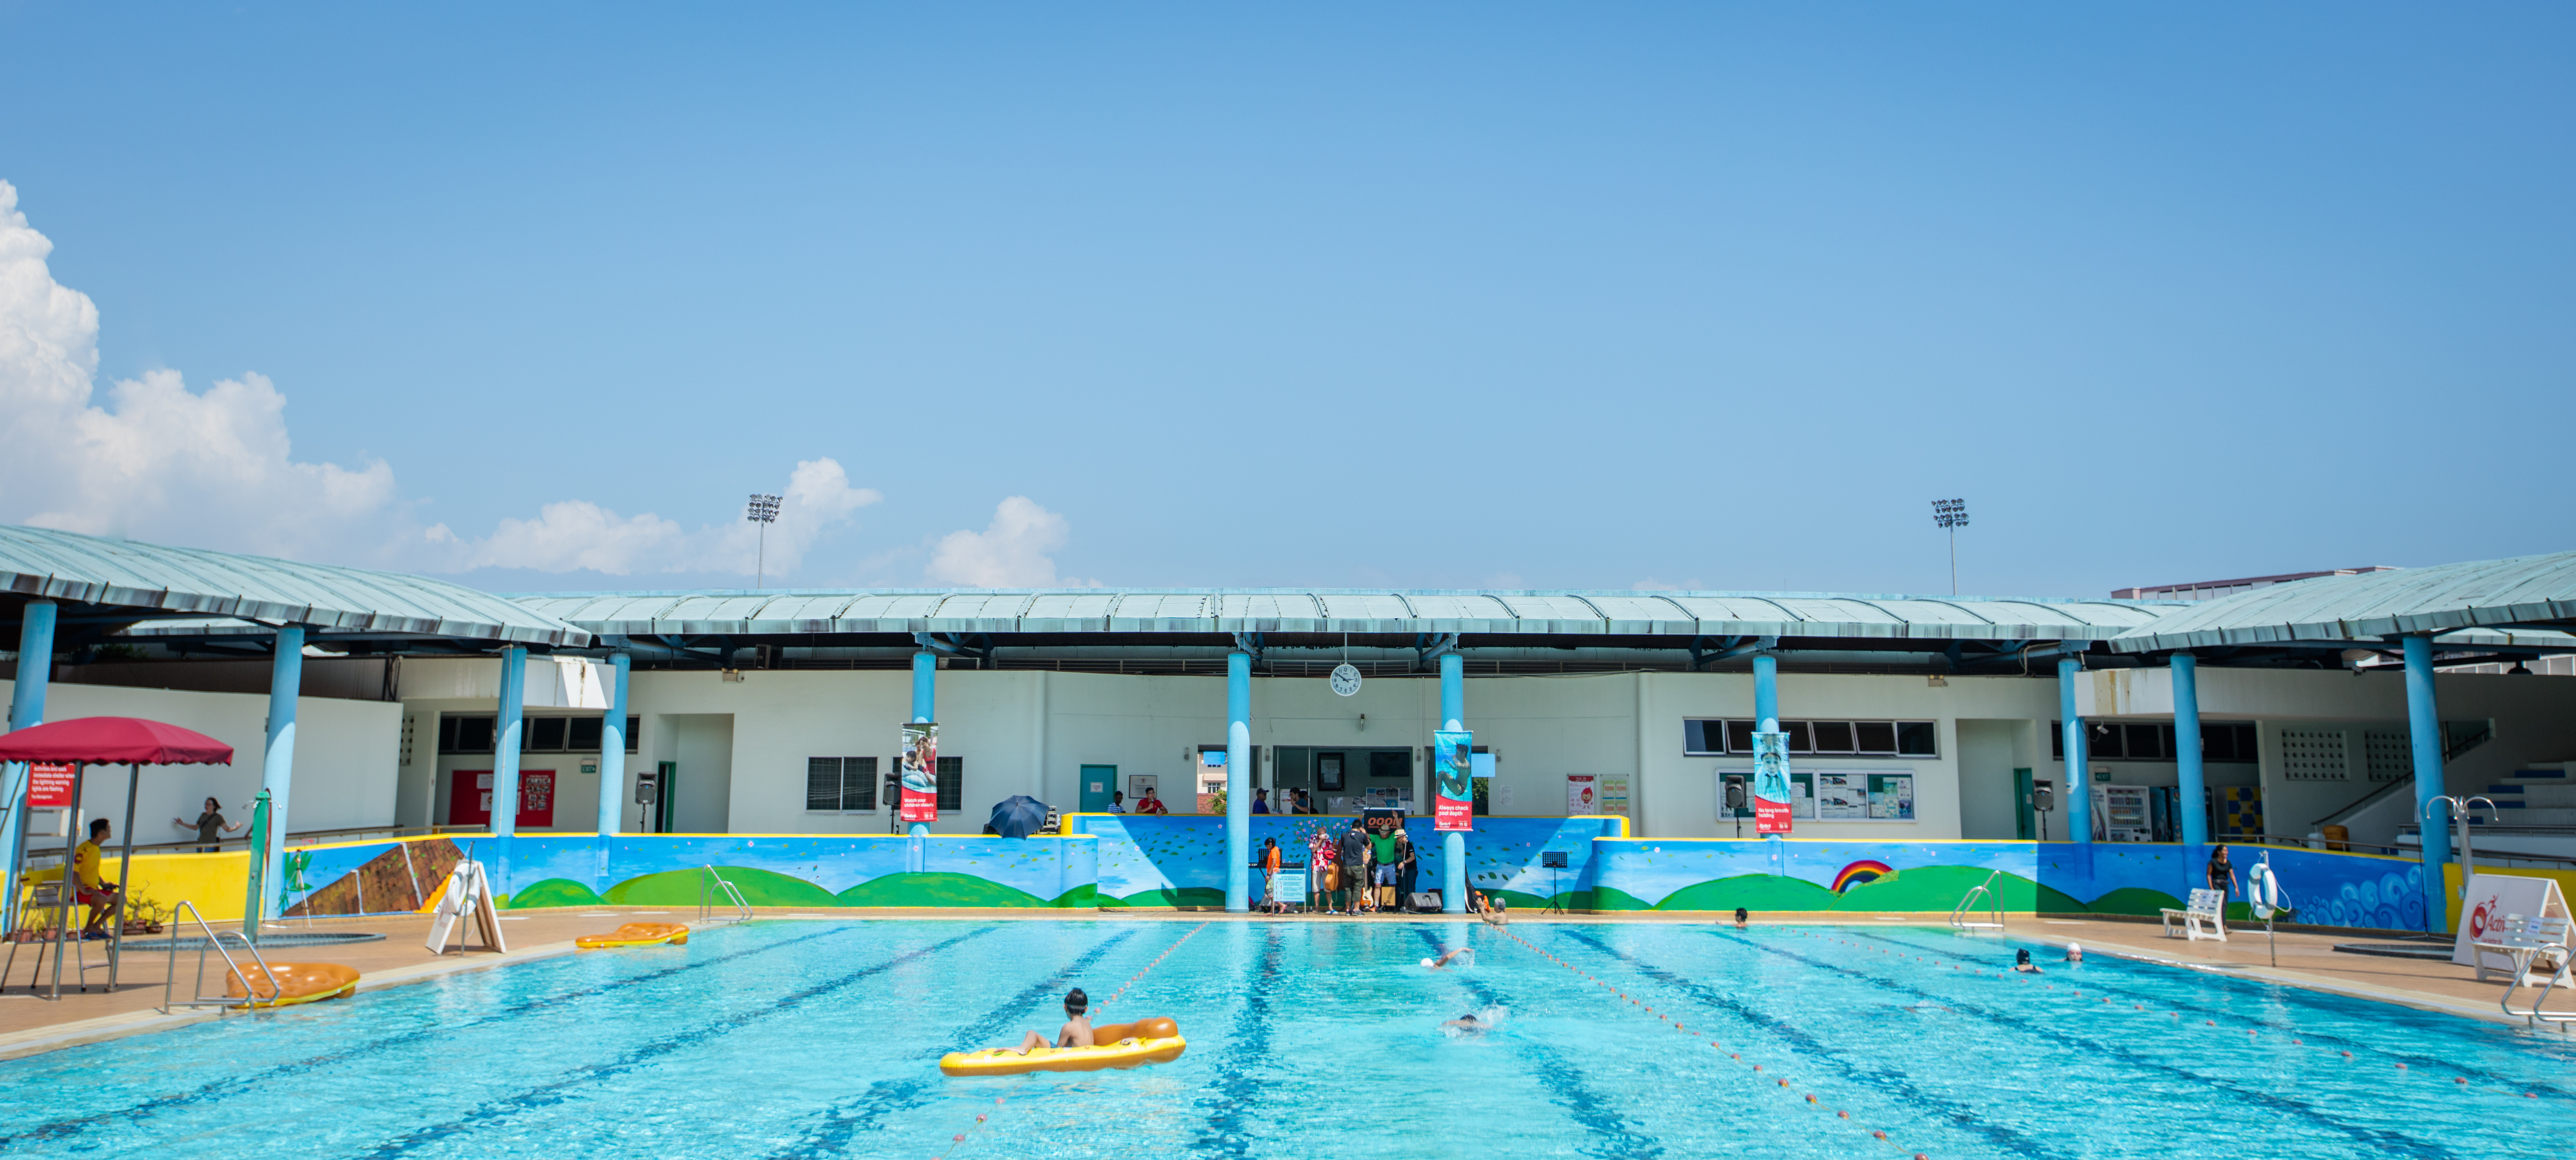 Serangoon Swimming Complex Mural